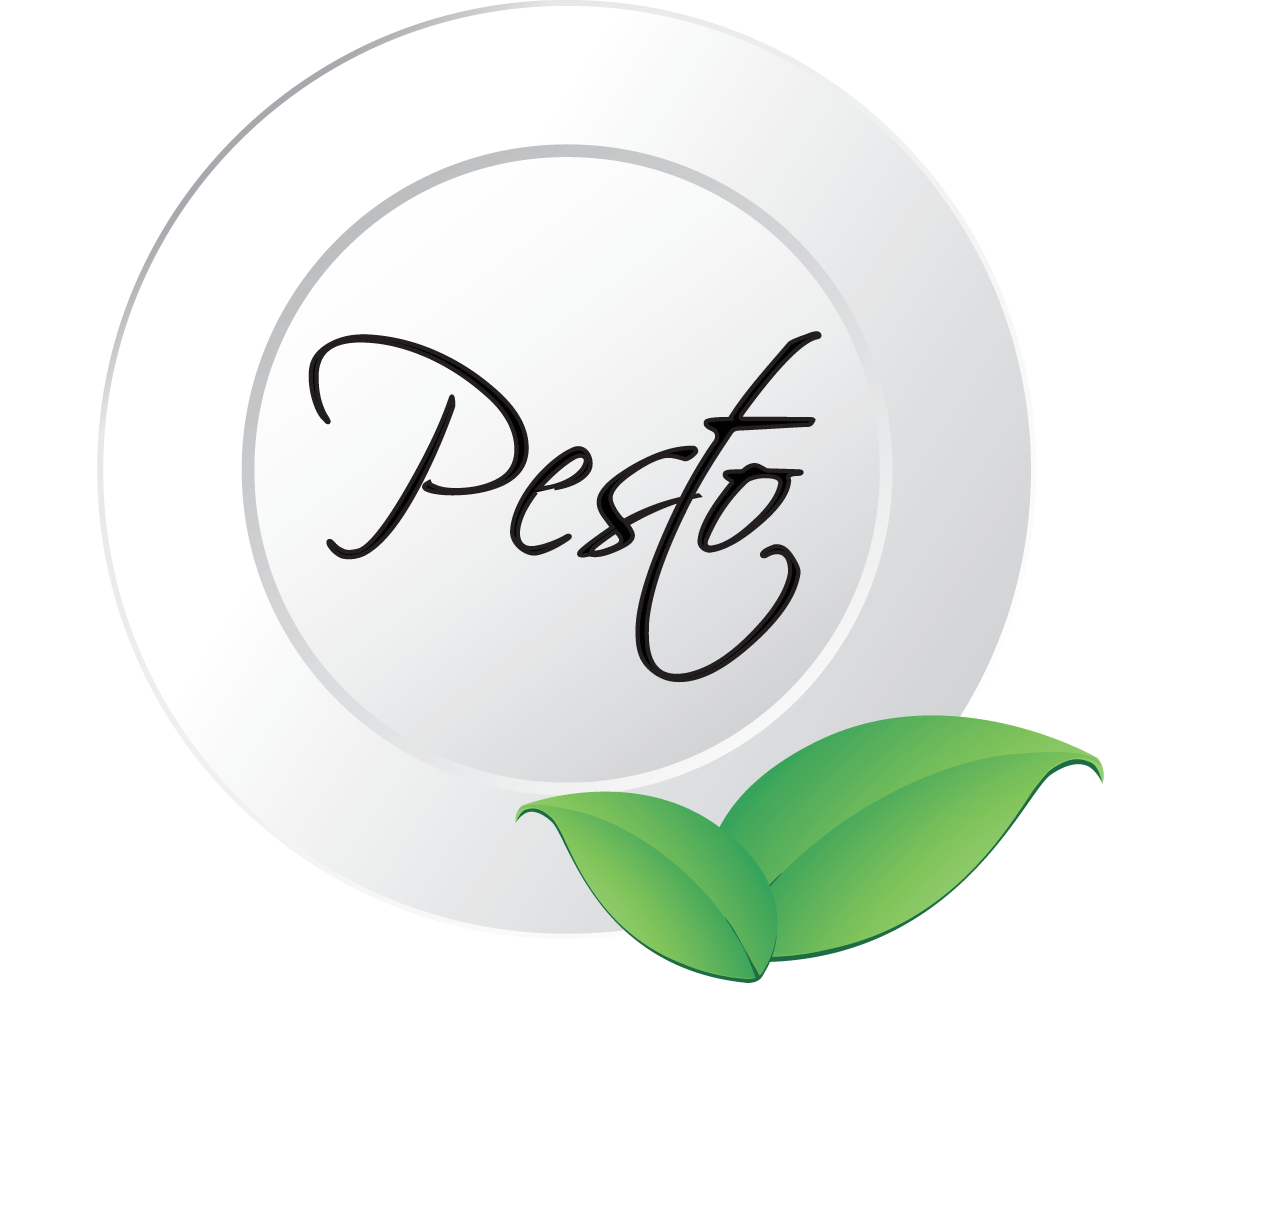 Pesto - Restauracja & Pizzeria